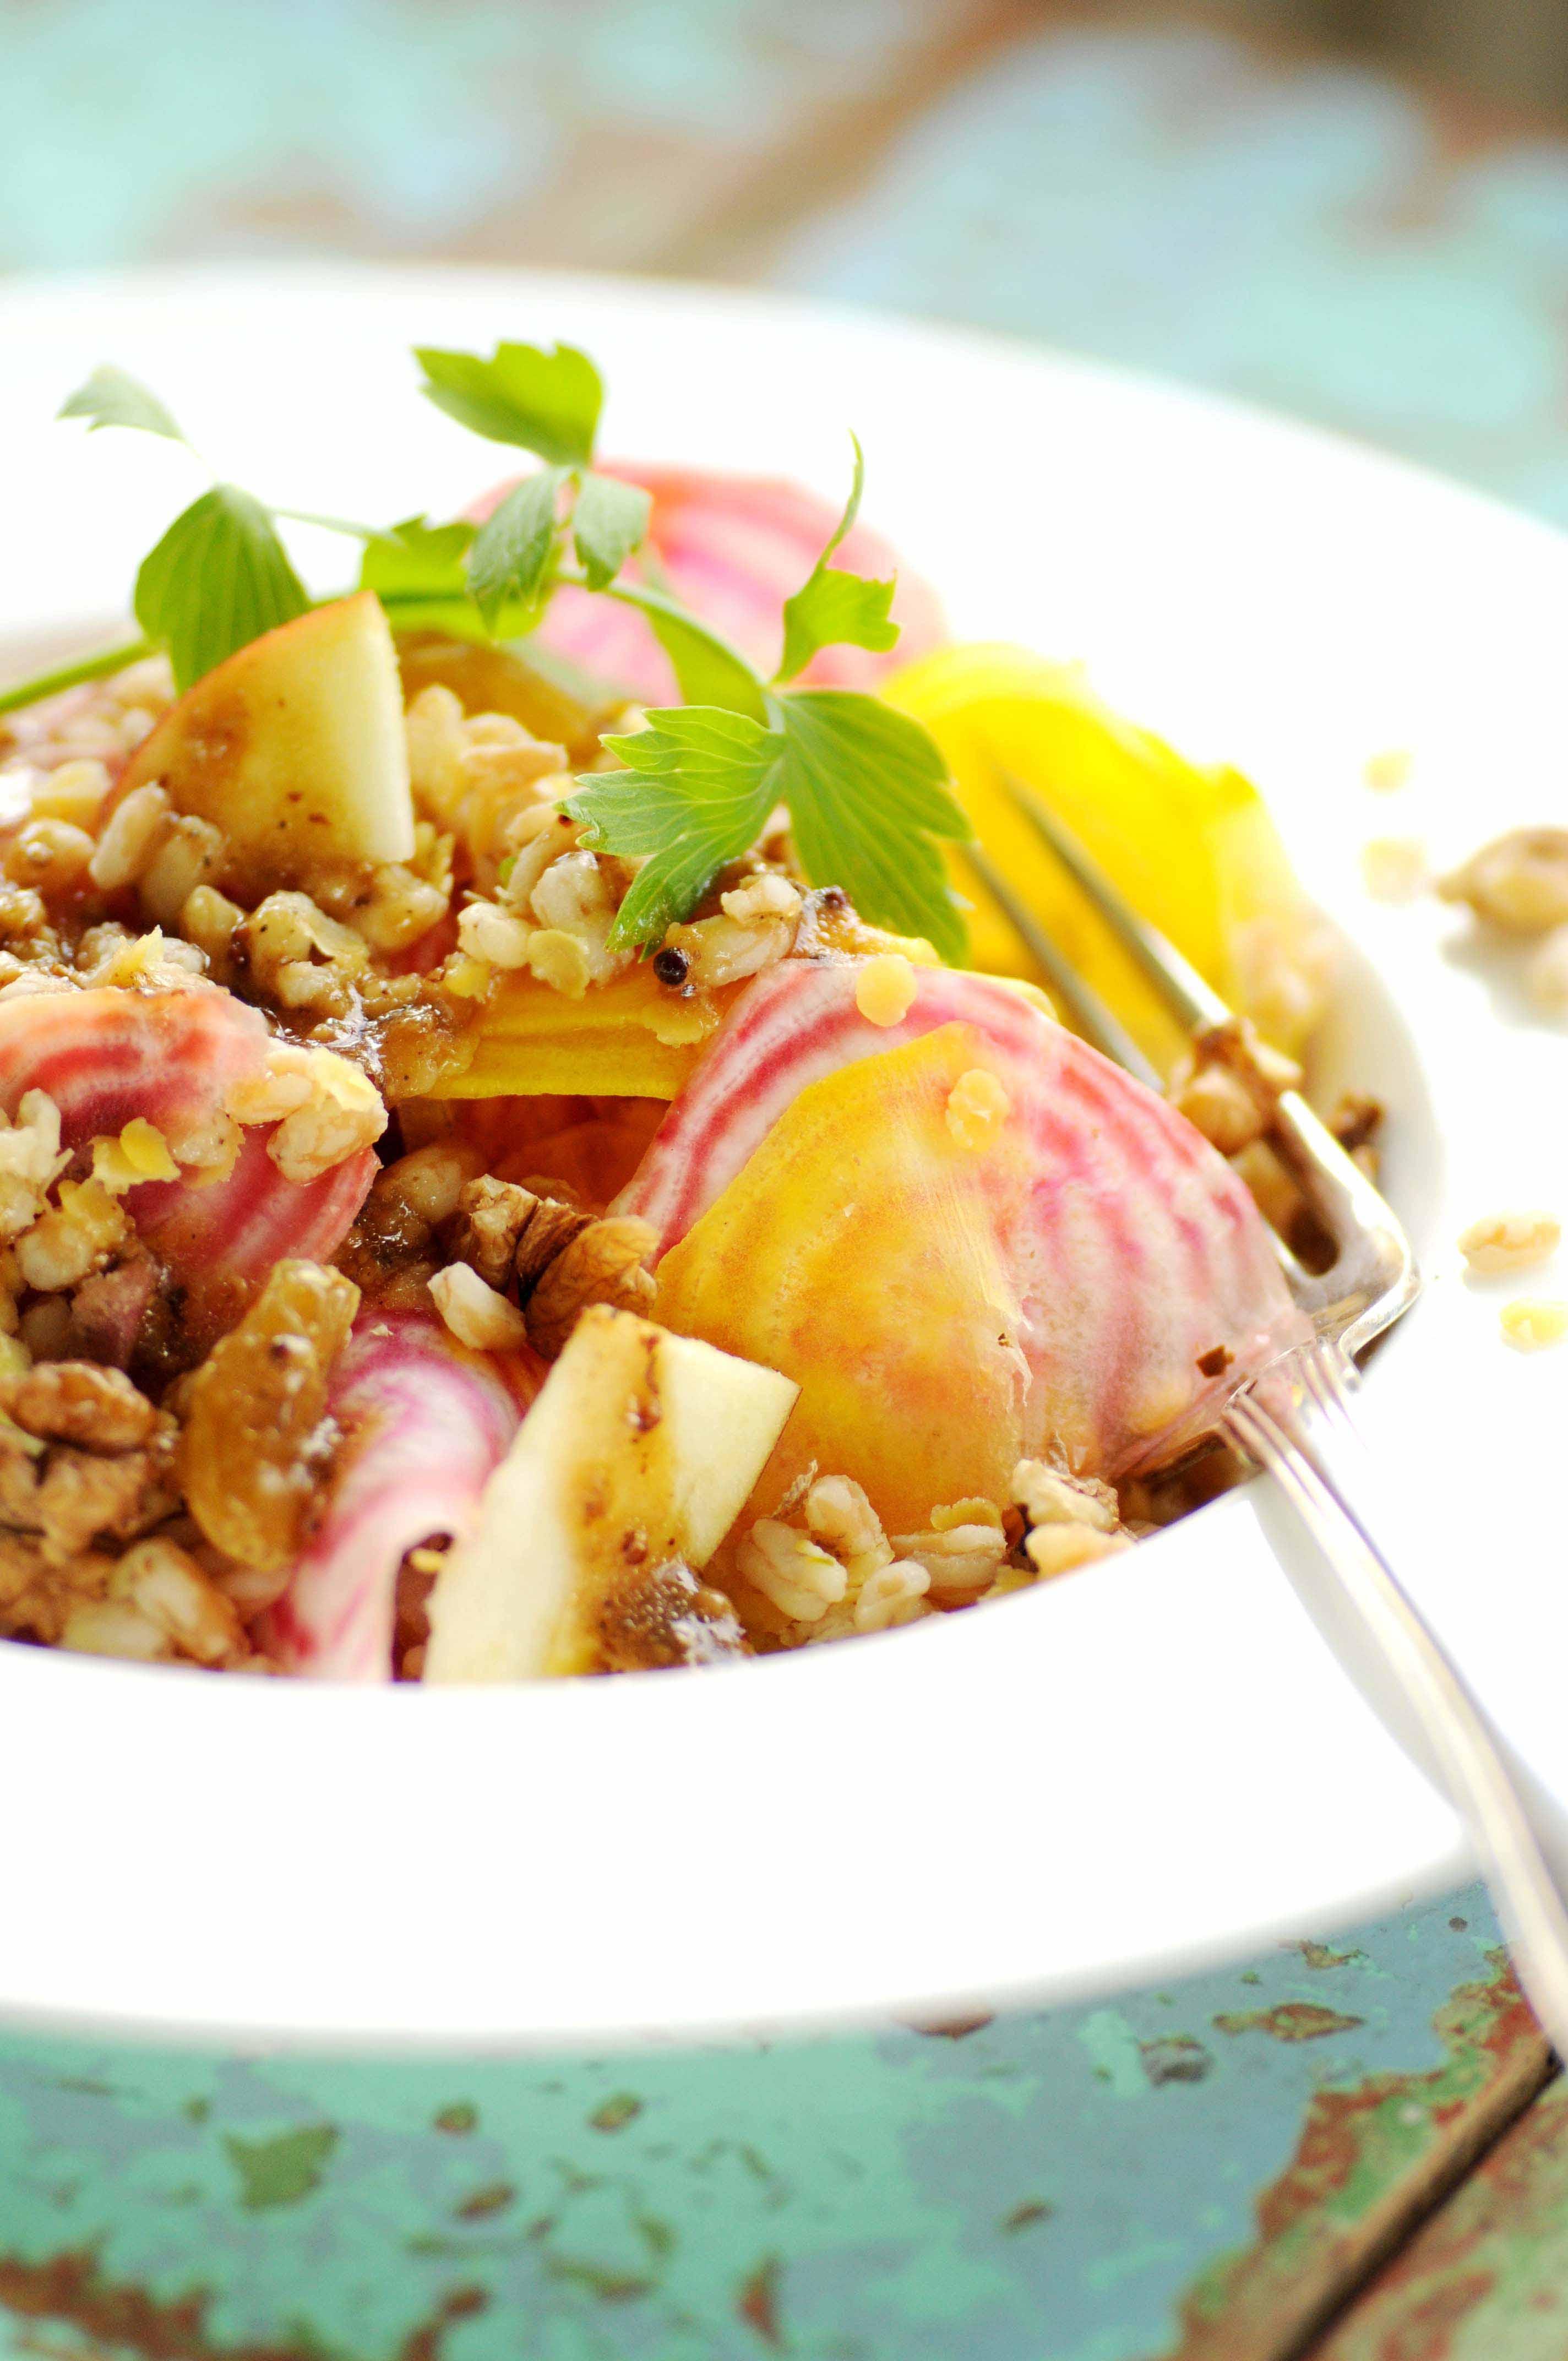 http://kirstenskaarup.dk/wp-content/uploads/2016/10/salat.perlebyg-og-rødbeder.2.jpg